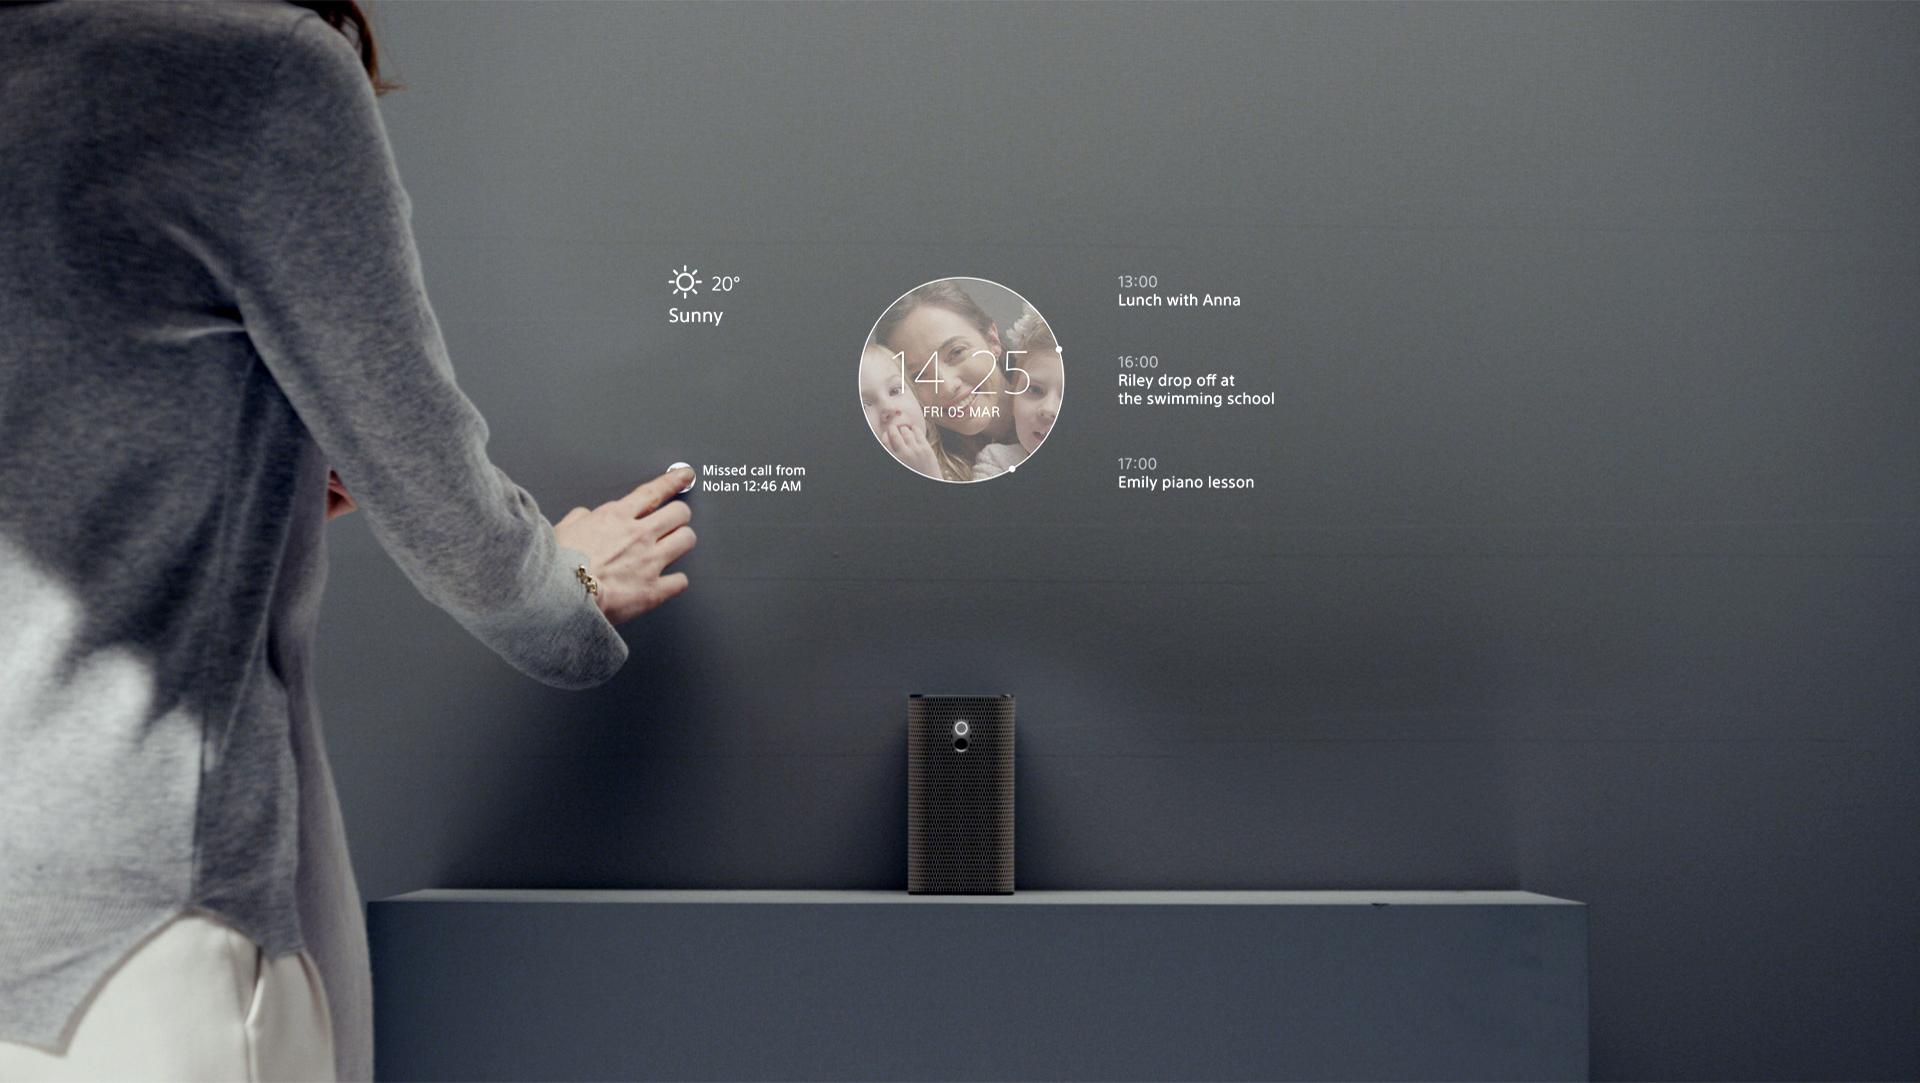 xperiatouchfeb28 El proyector de Sony: Xperia Touch